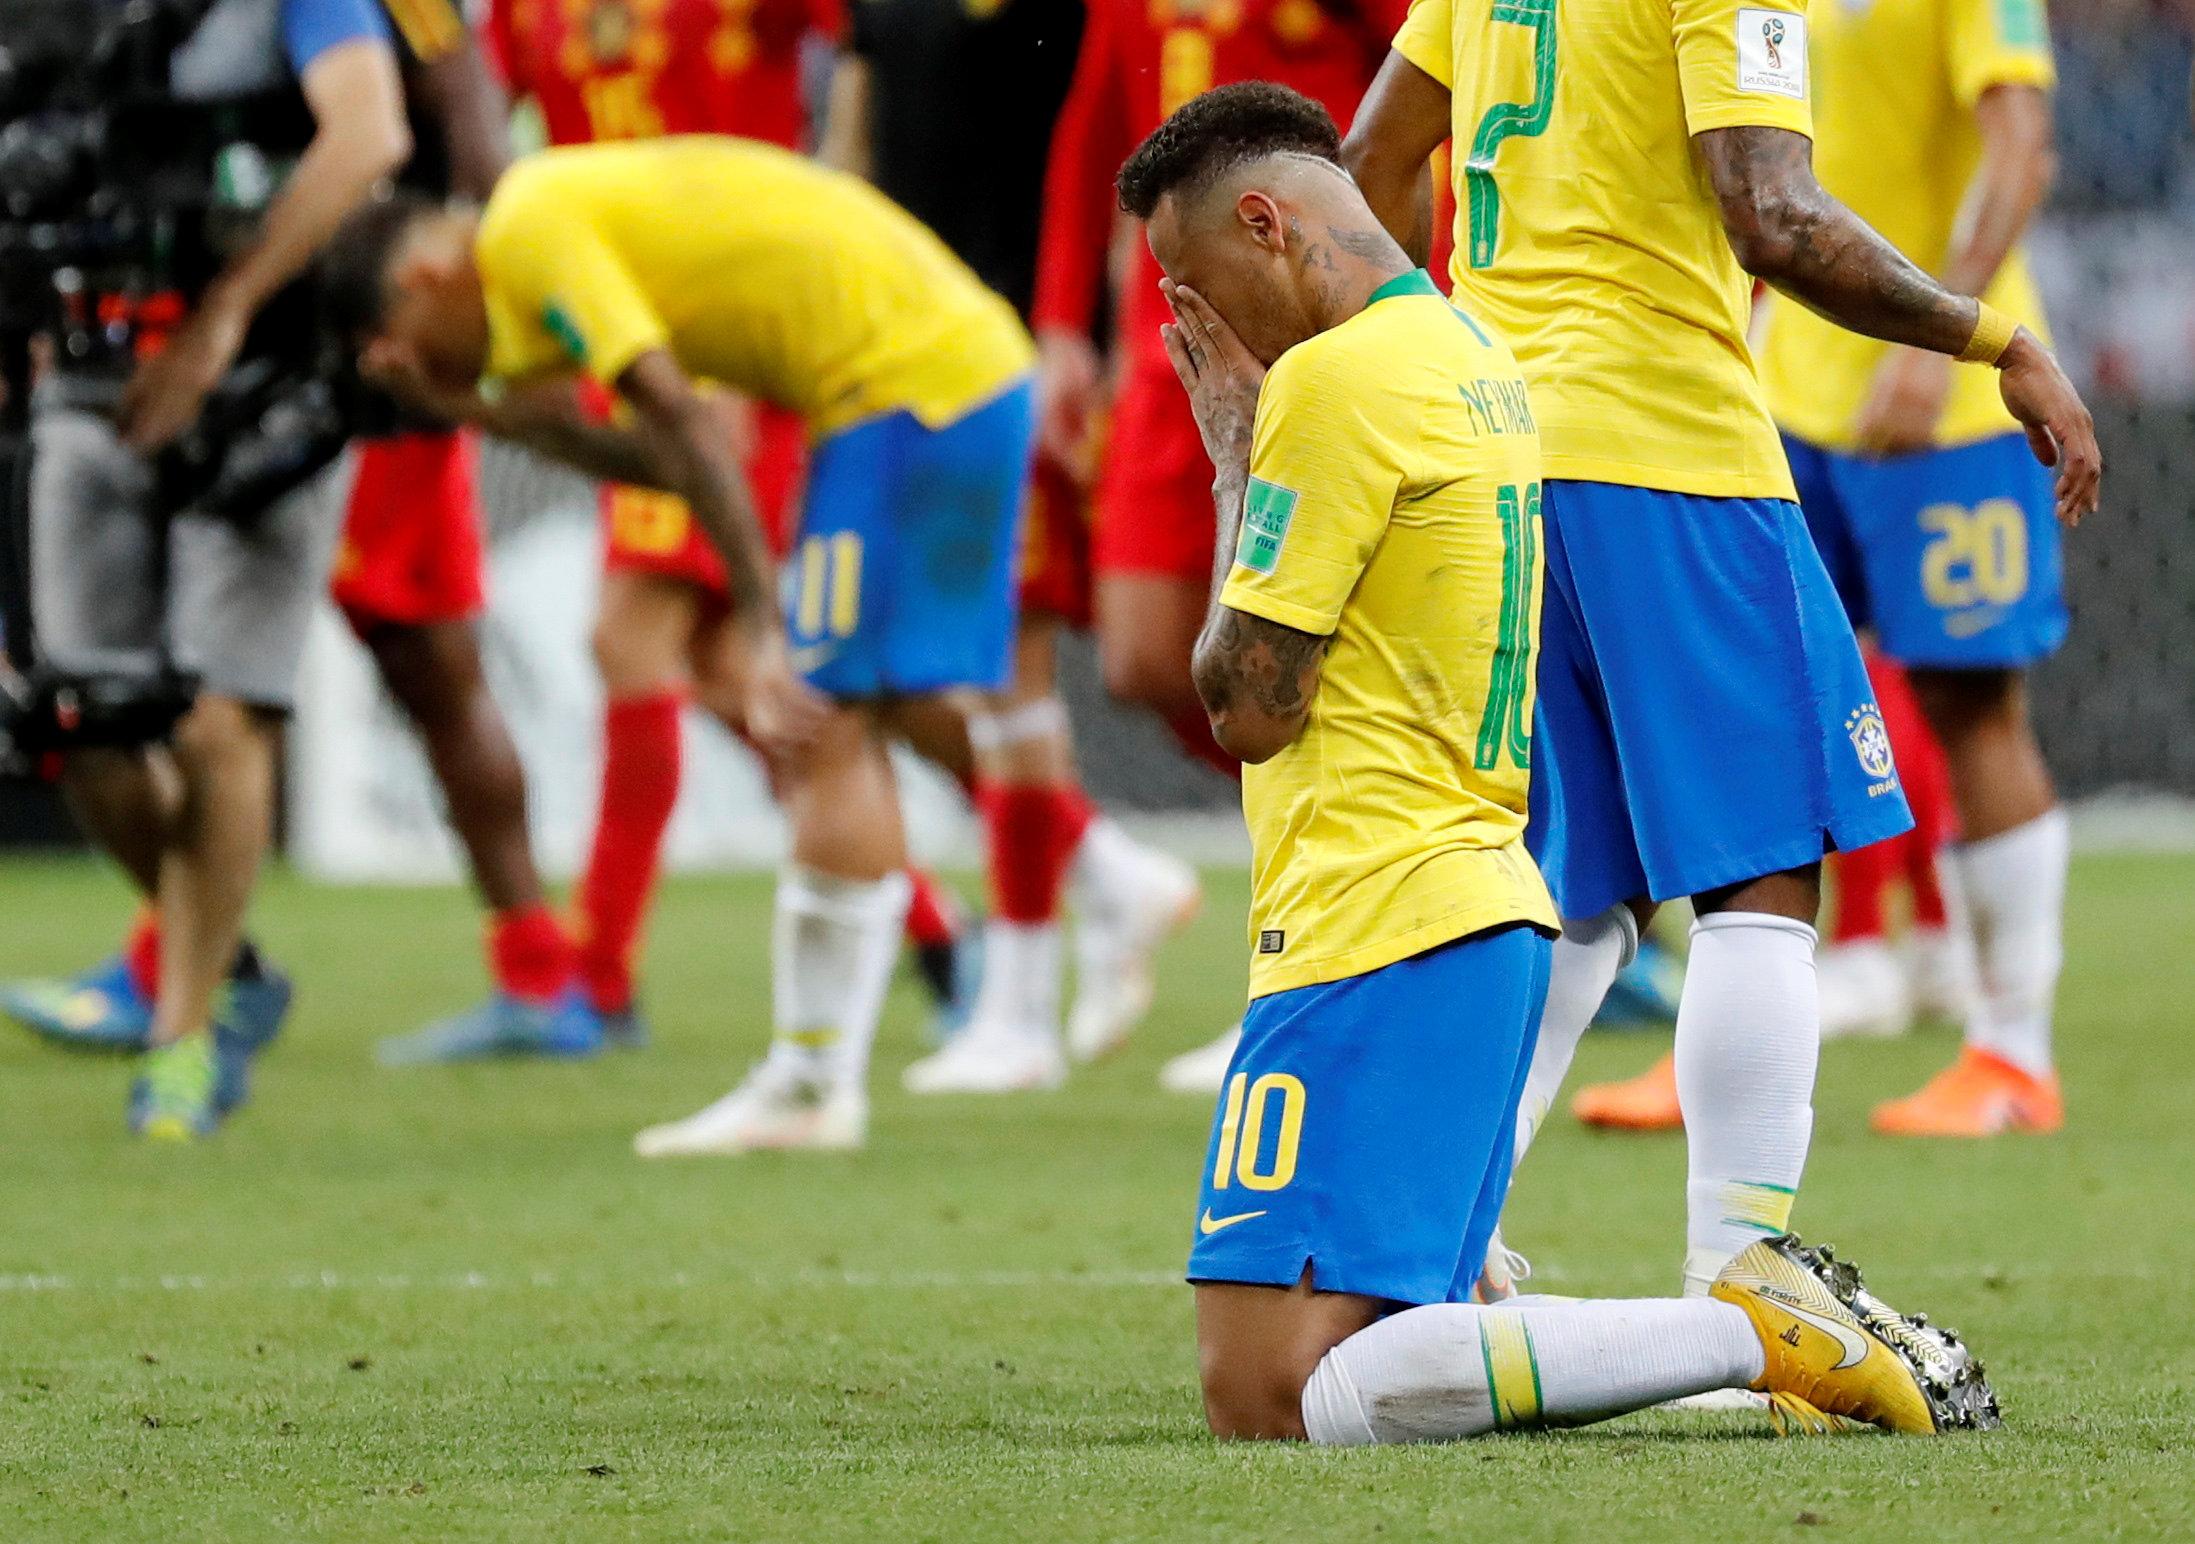 Soccer Football - World Cup - Quarter Final - Brazil vs Belgium - Kazan Arena, Kazan, Russia - July 6, 2018  Brazil's Neymar looks dejected at the end of the match   REUTERS/Toru Hanai